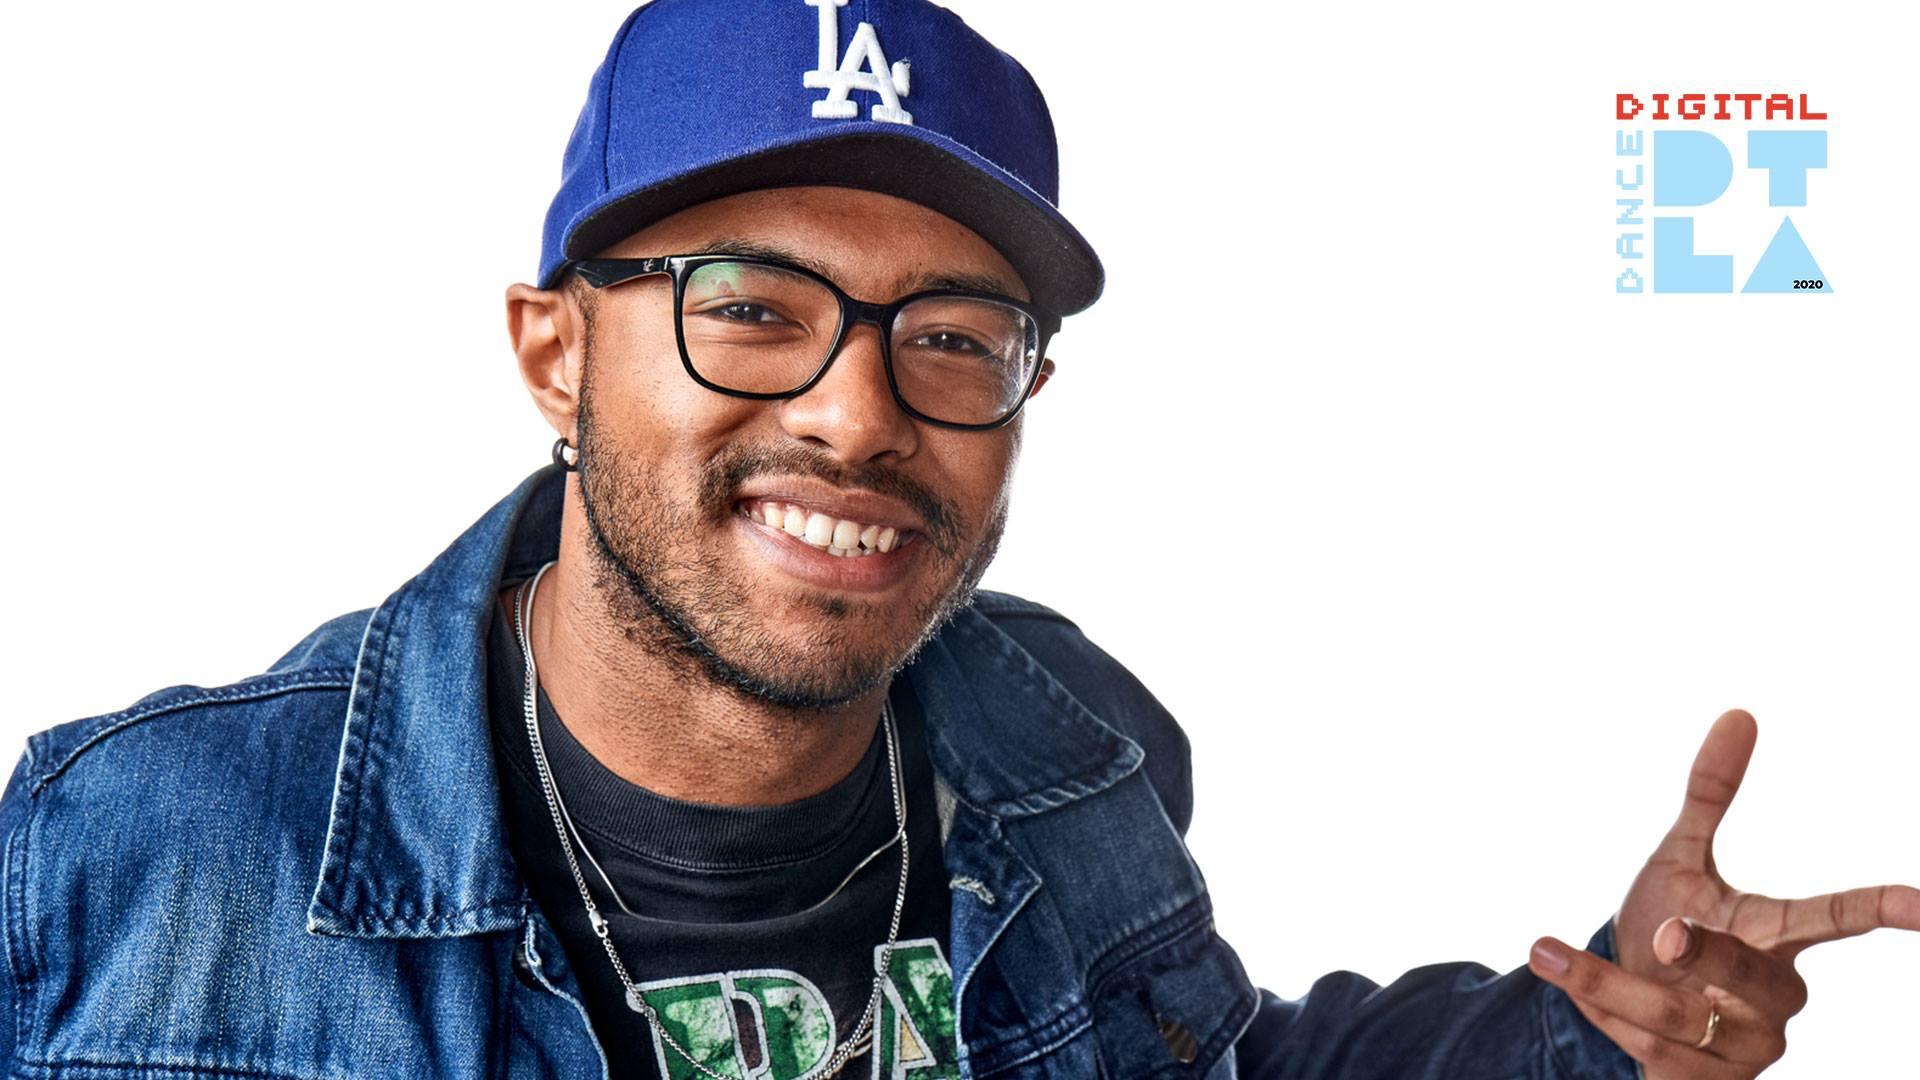 The Music Center's Digital Dance DTLA: Hip-Hop